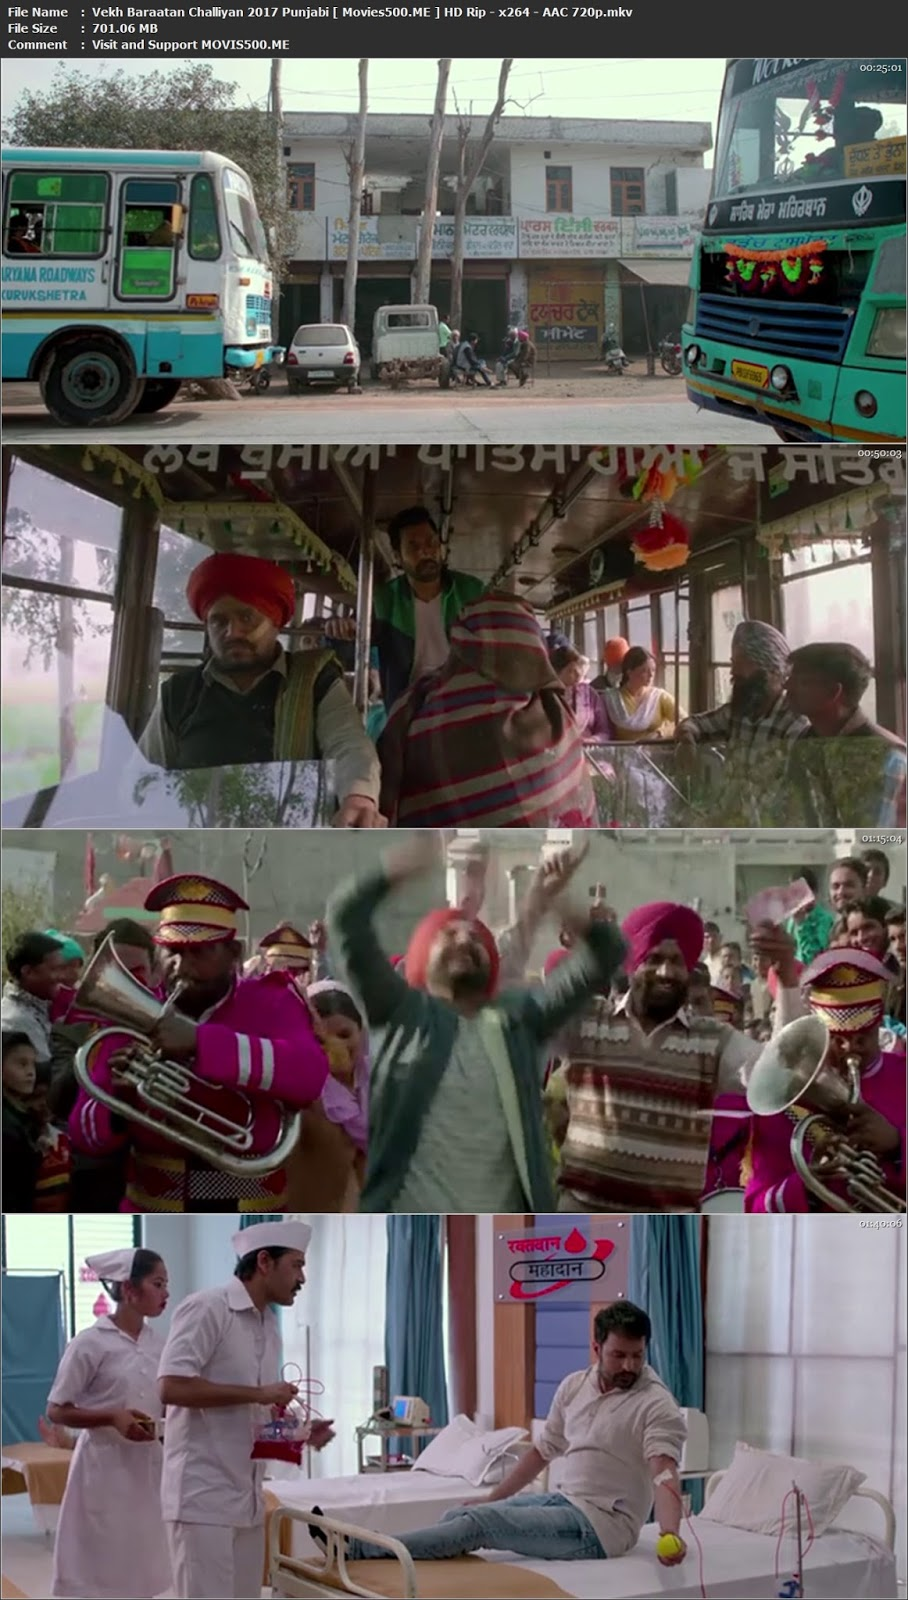 Vekh Baraatan Challiyan 2017 Punjabi Movie HDRip 720p at freedomcopy.com